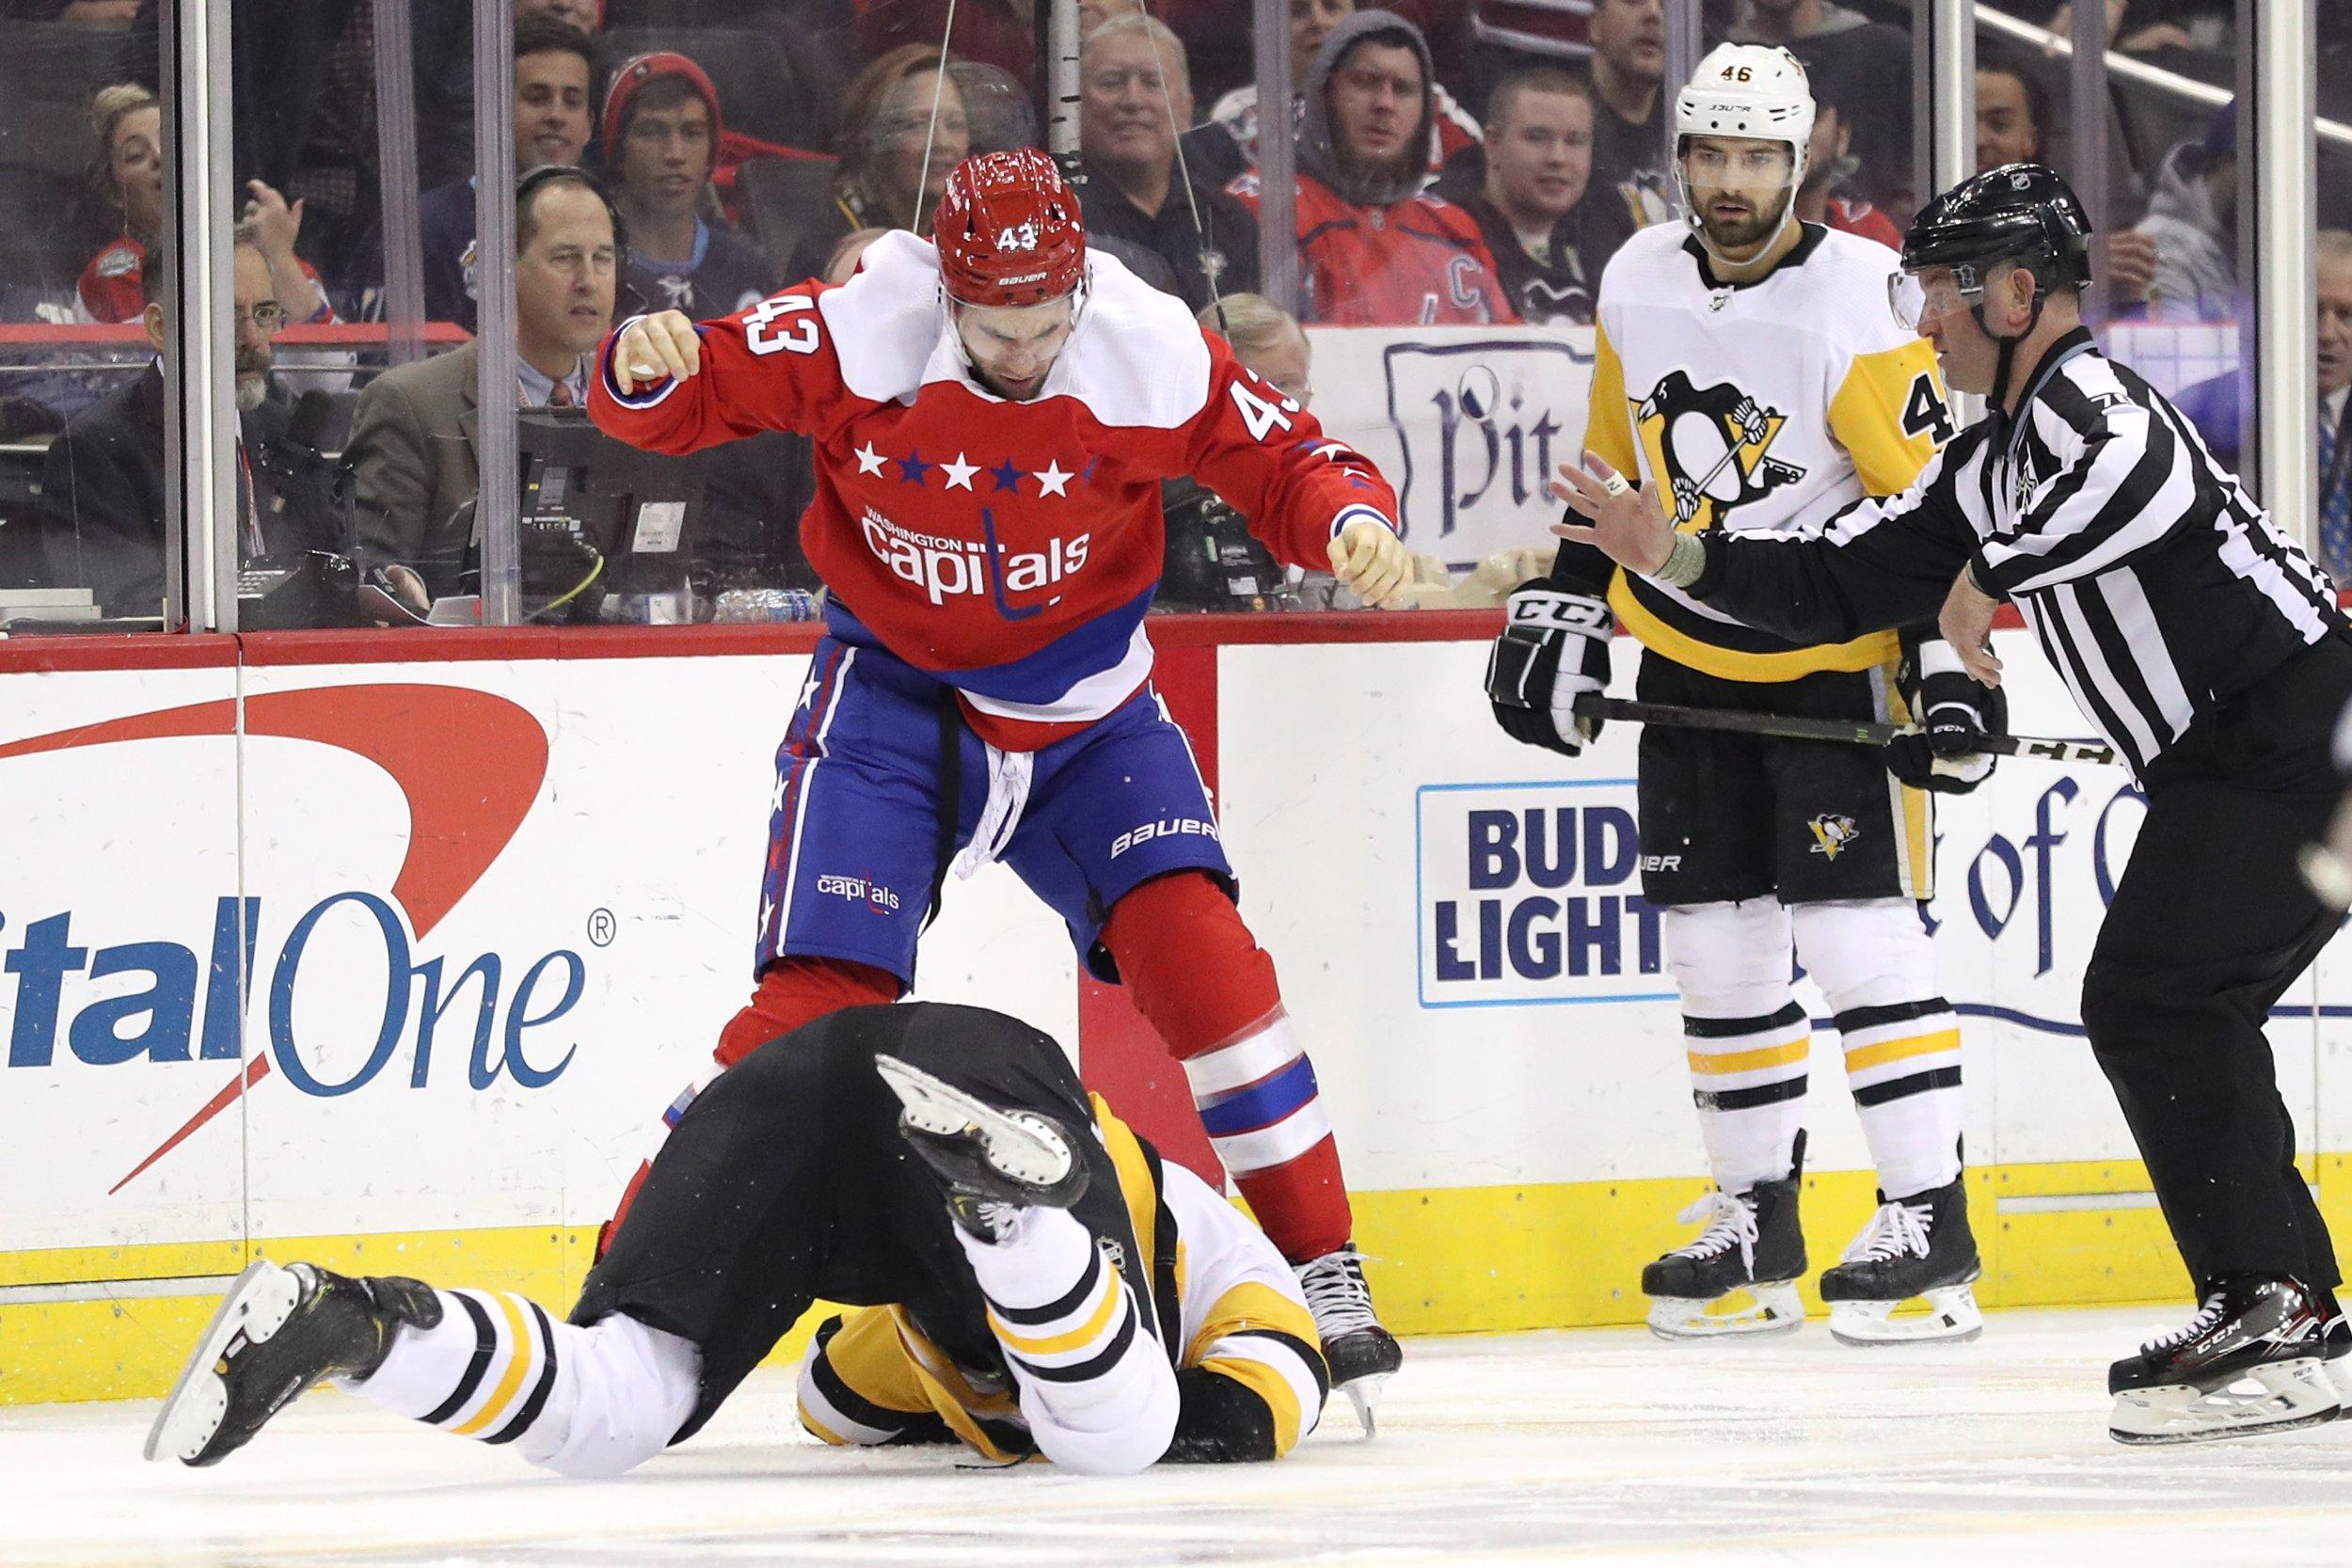 Tom Wilson,Washington Capitals, Jamie Oleksiak, Pittsburgh Penguins